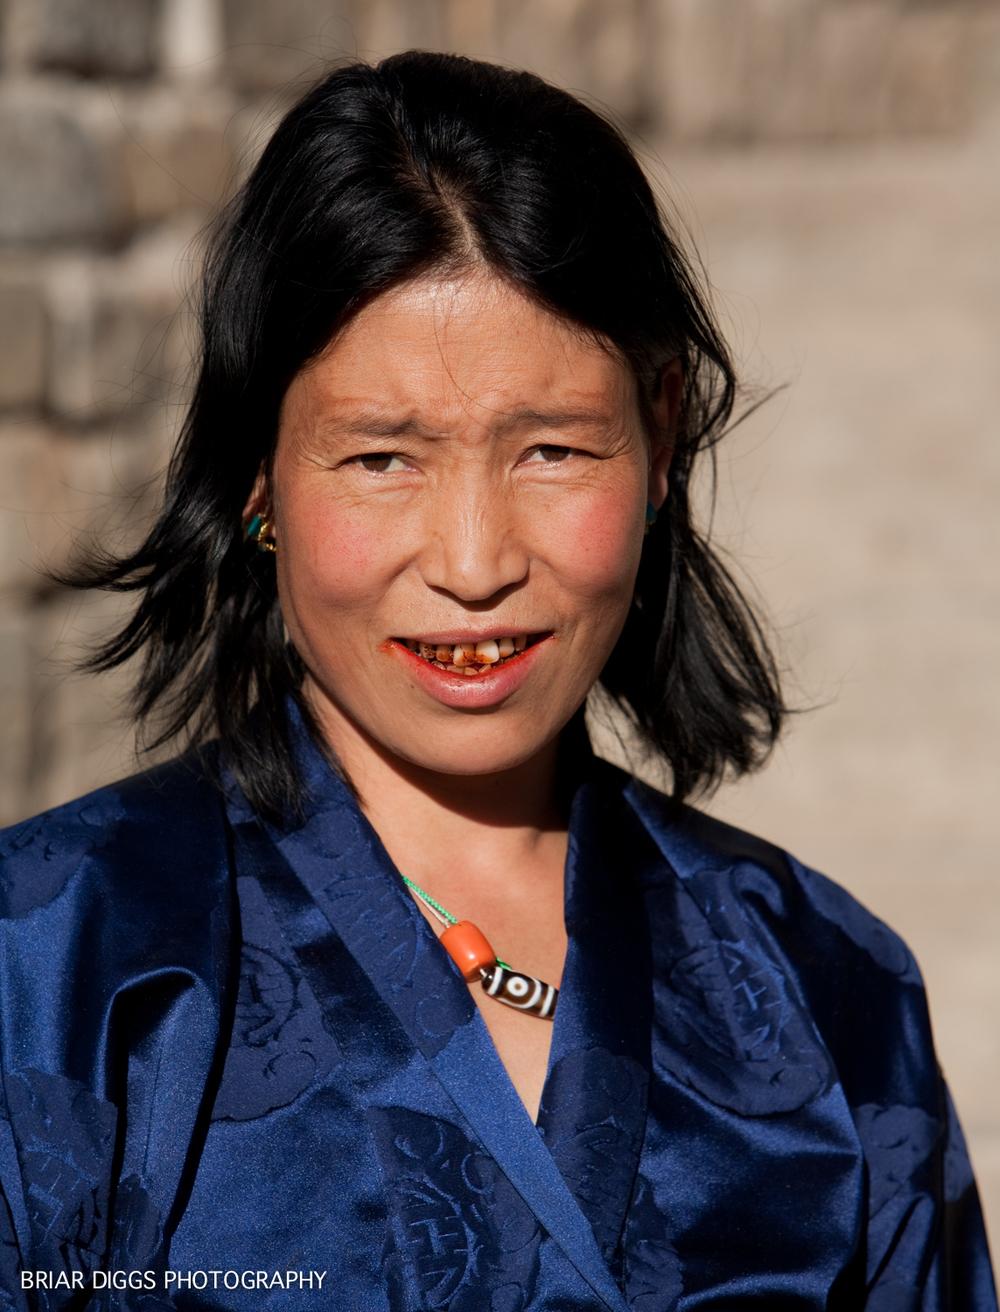 BHUTANESE PORTRAITS-13.jpg